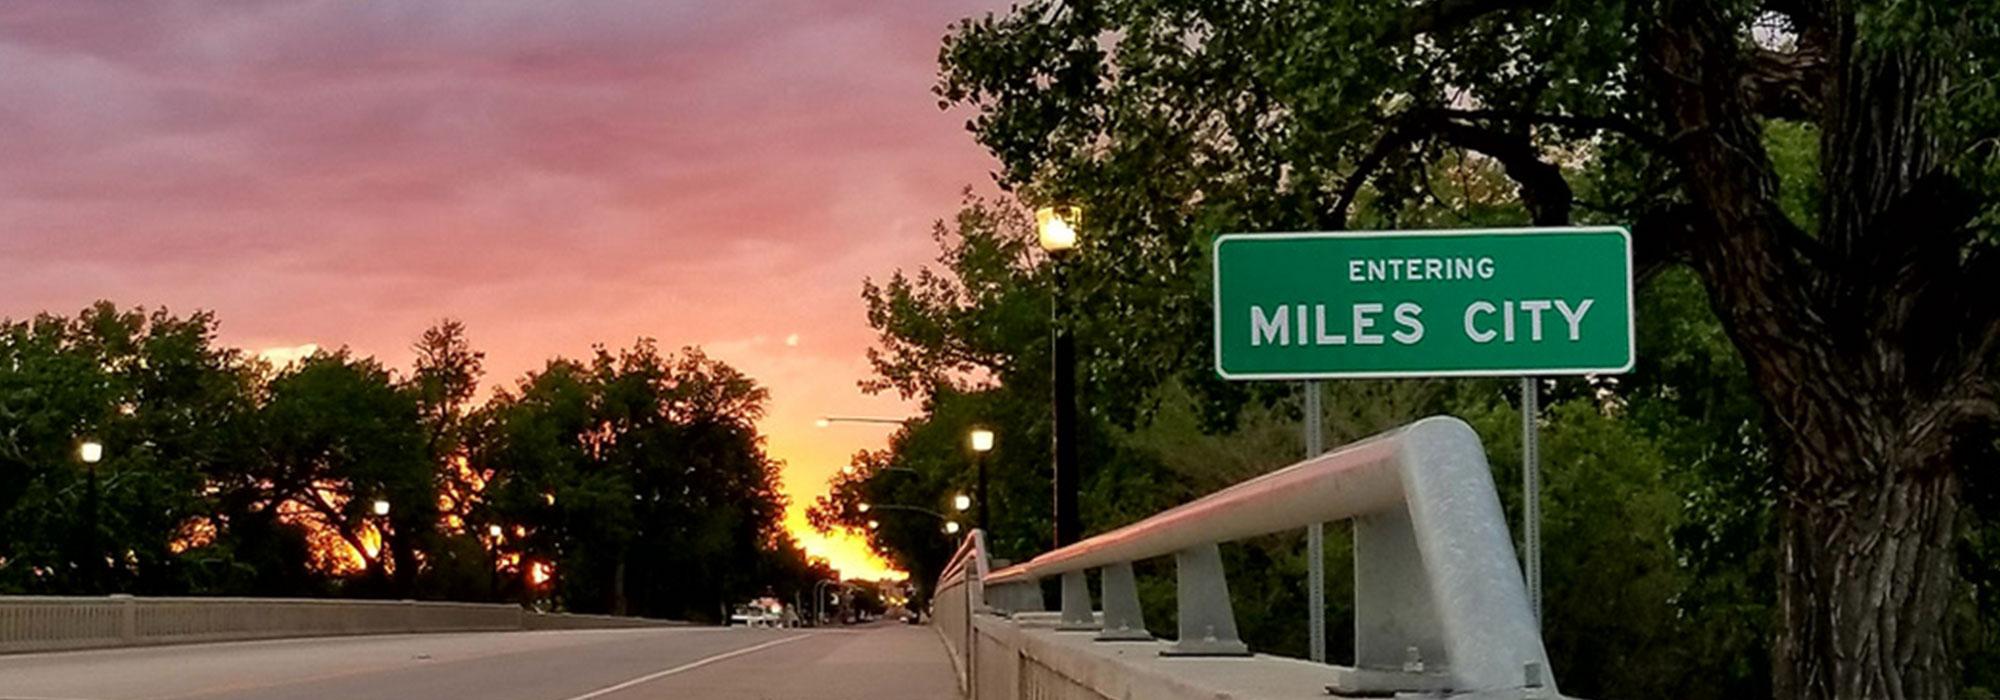 slider-1-CoC-entering-miles-city_6-1-2020-a